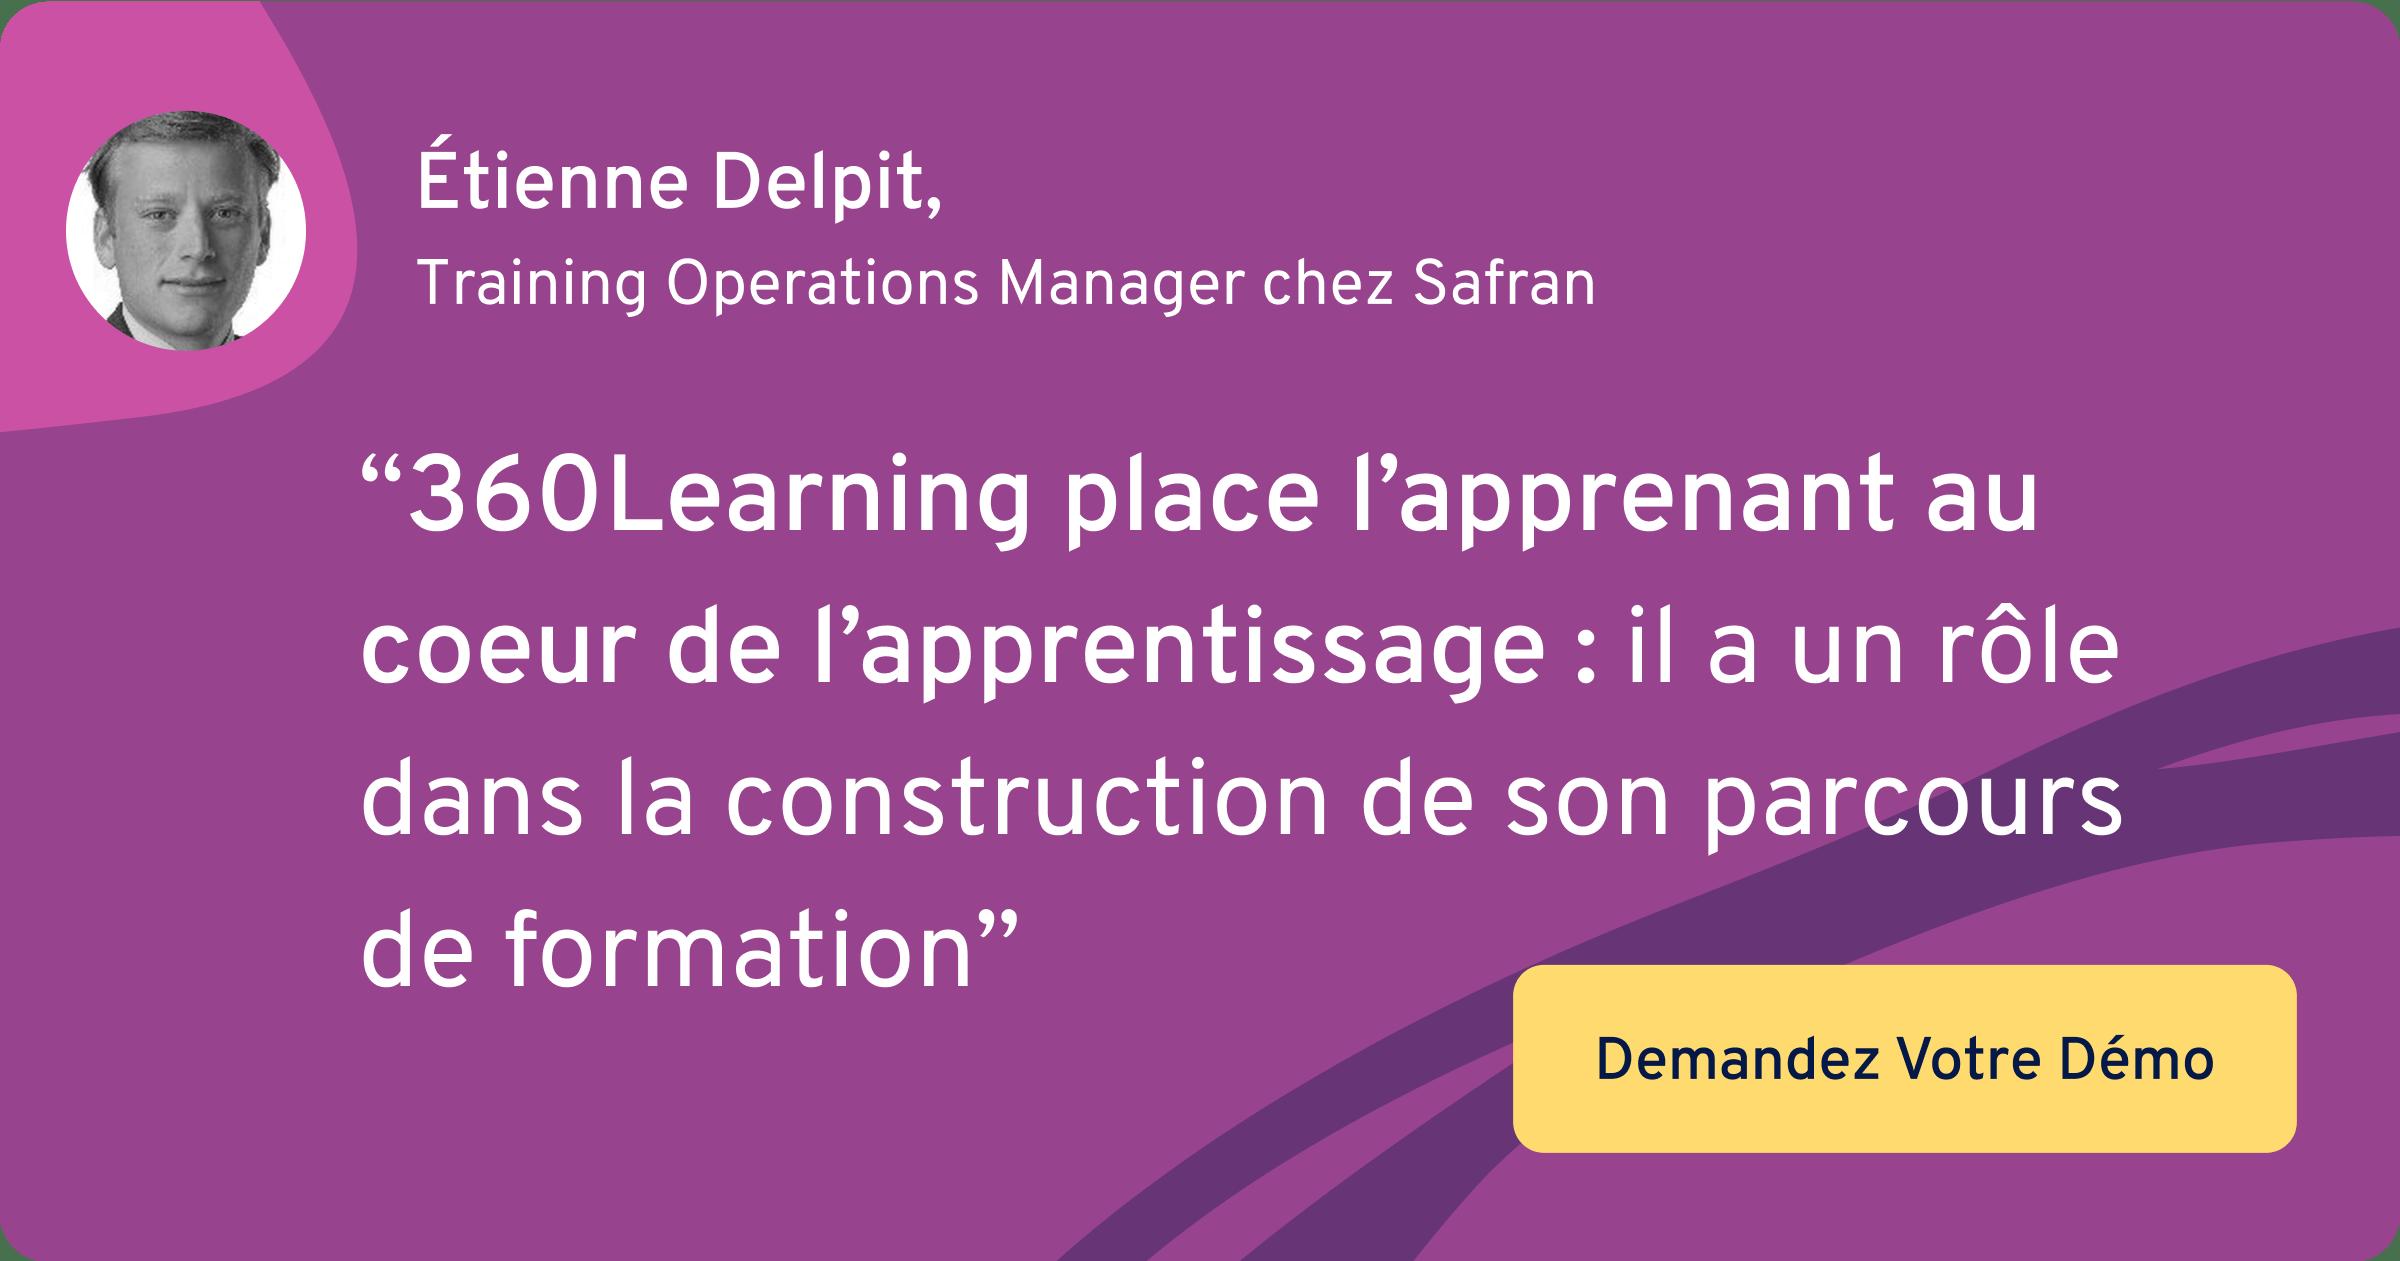 safran-digital-learning-award